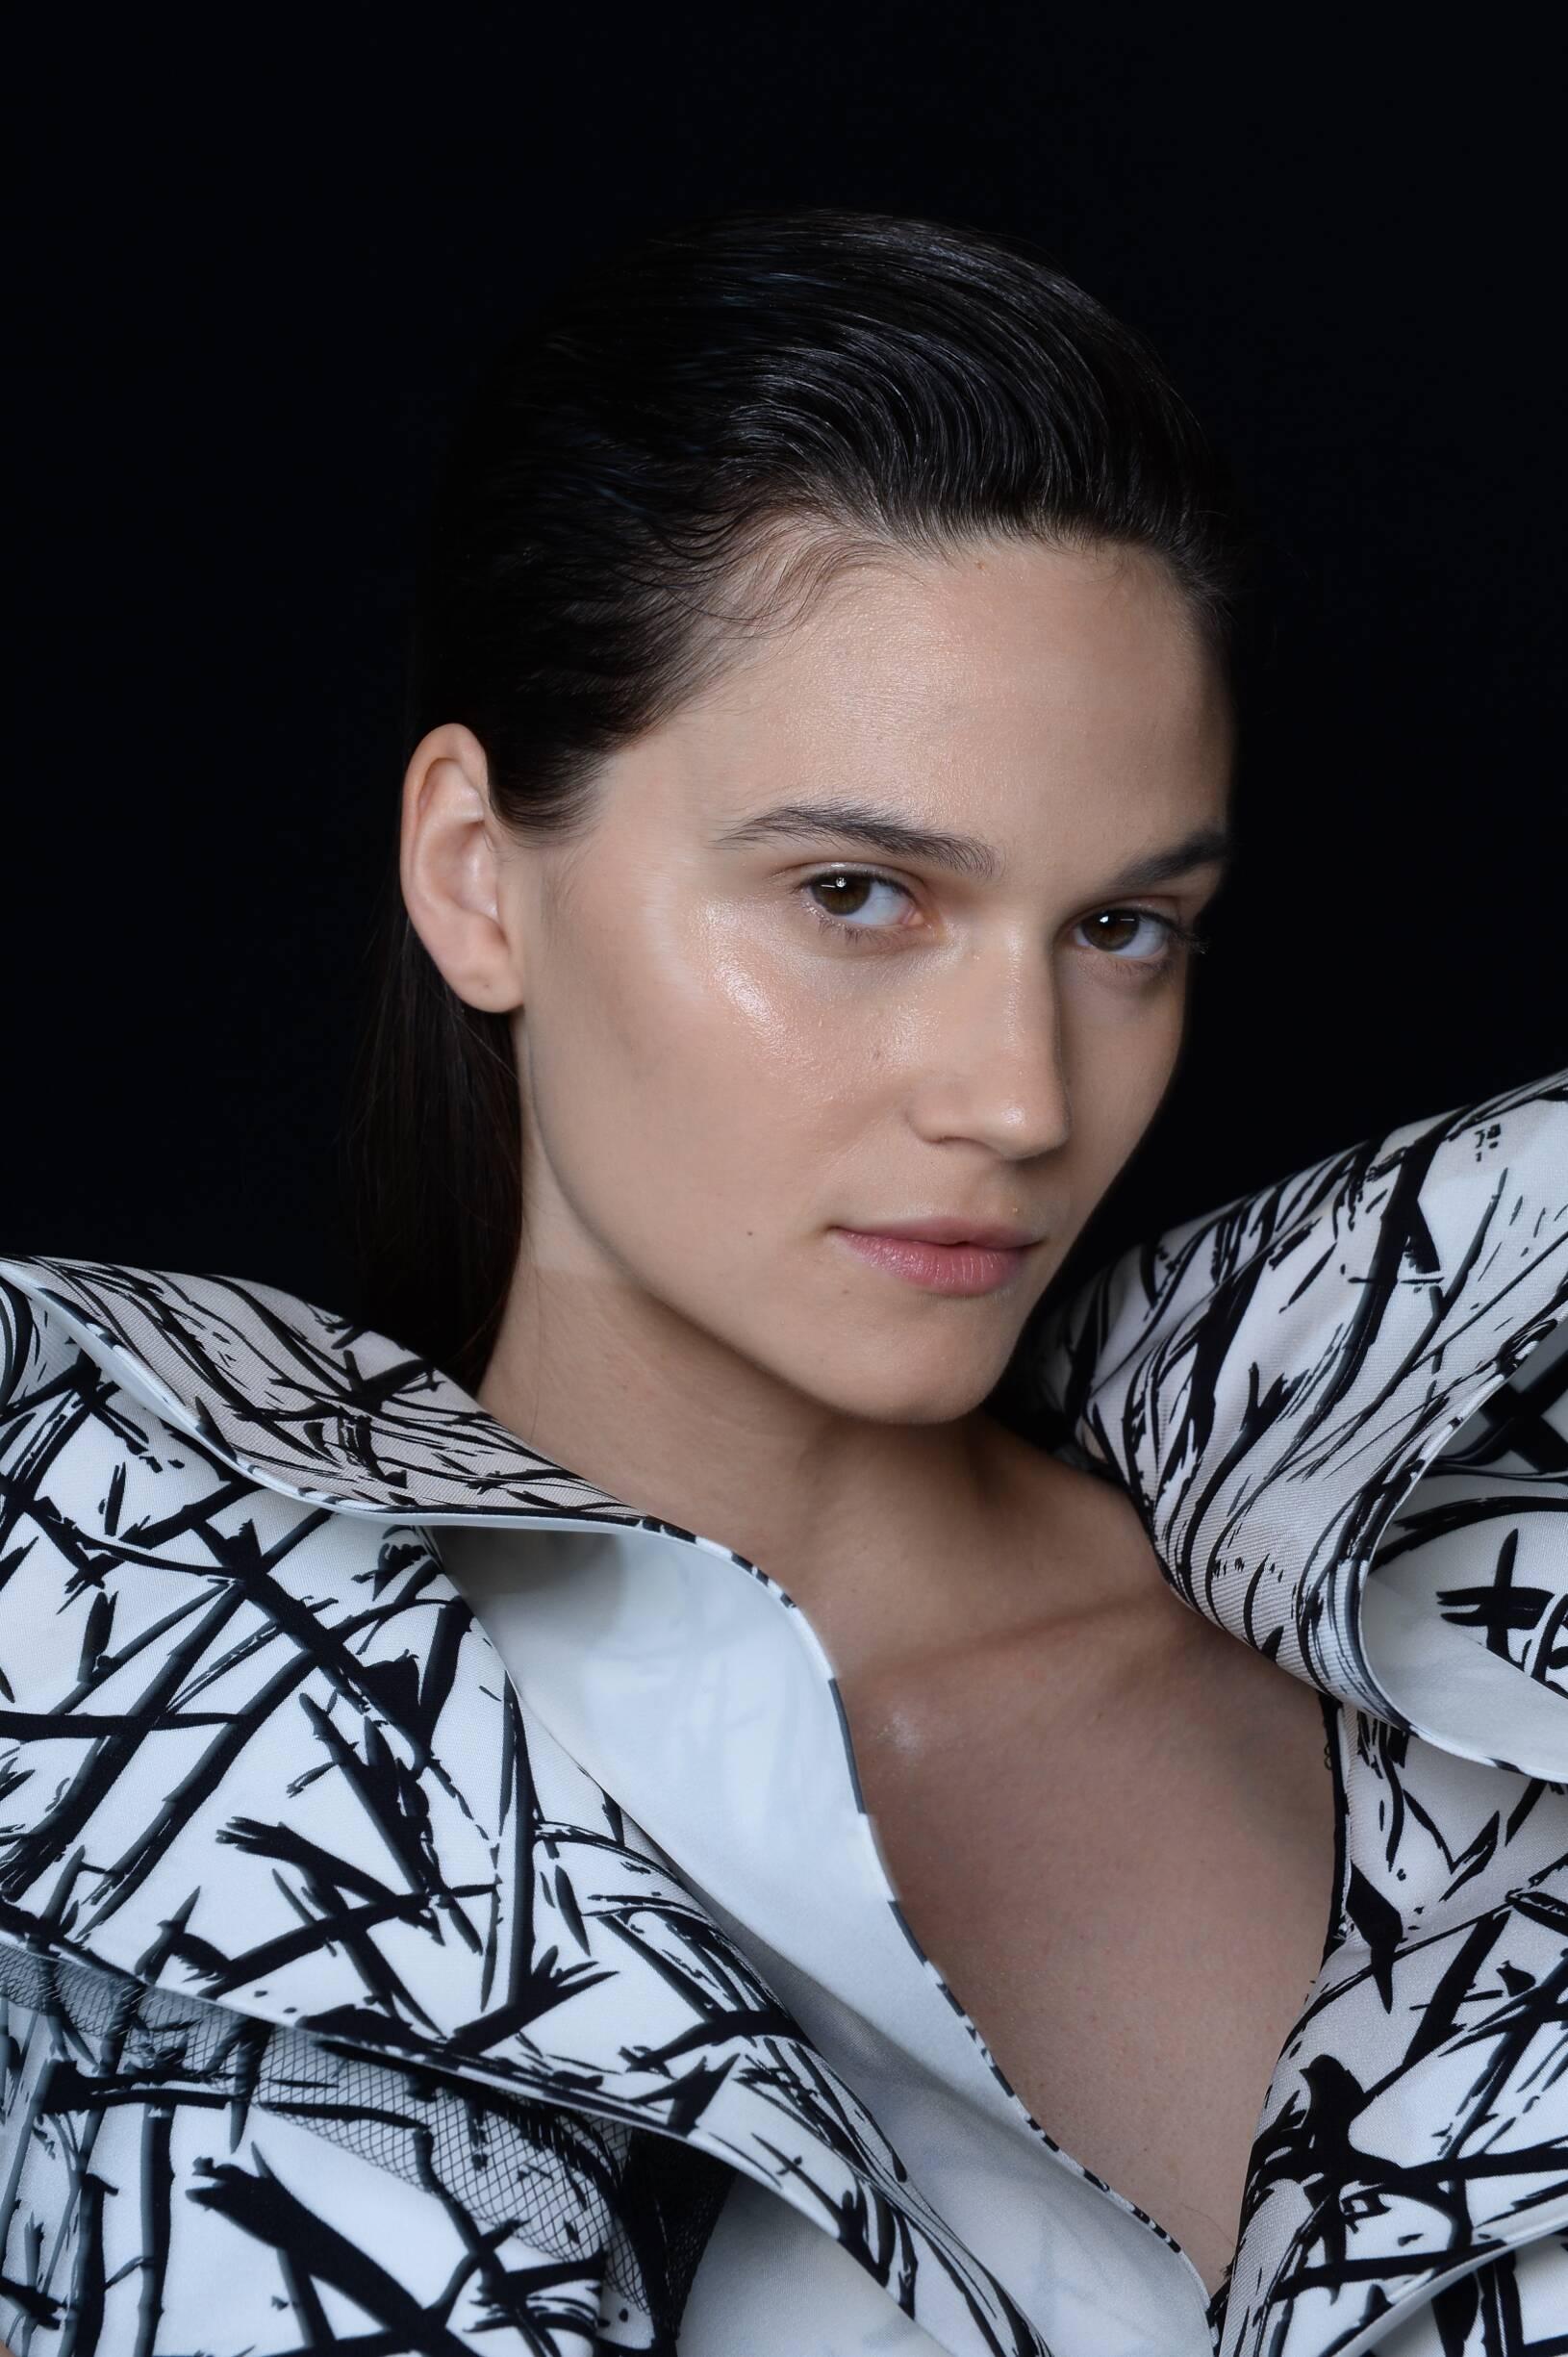 Fashion Model Emanuel Ungaro Womenswear Backstage